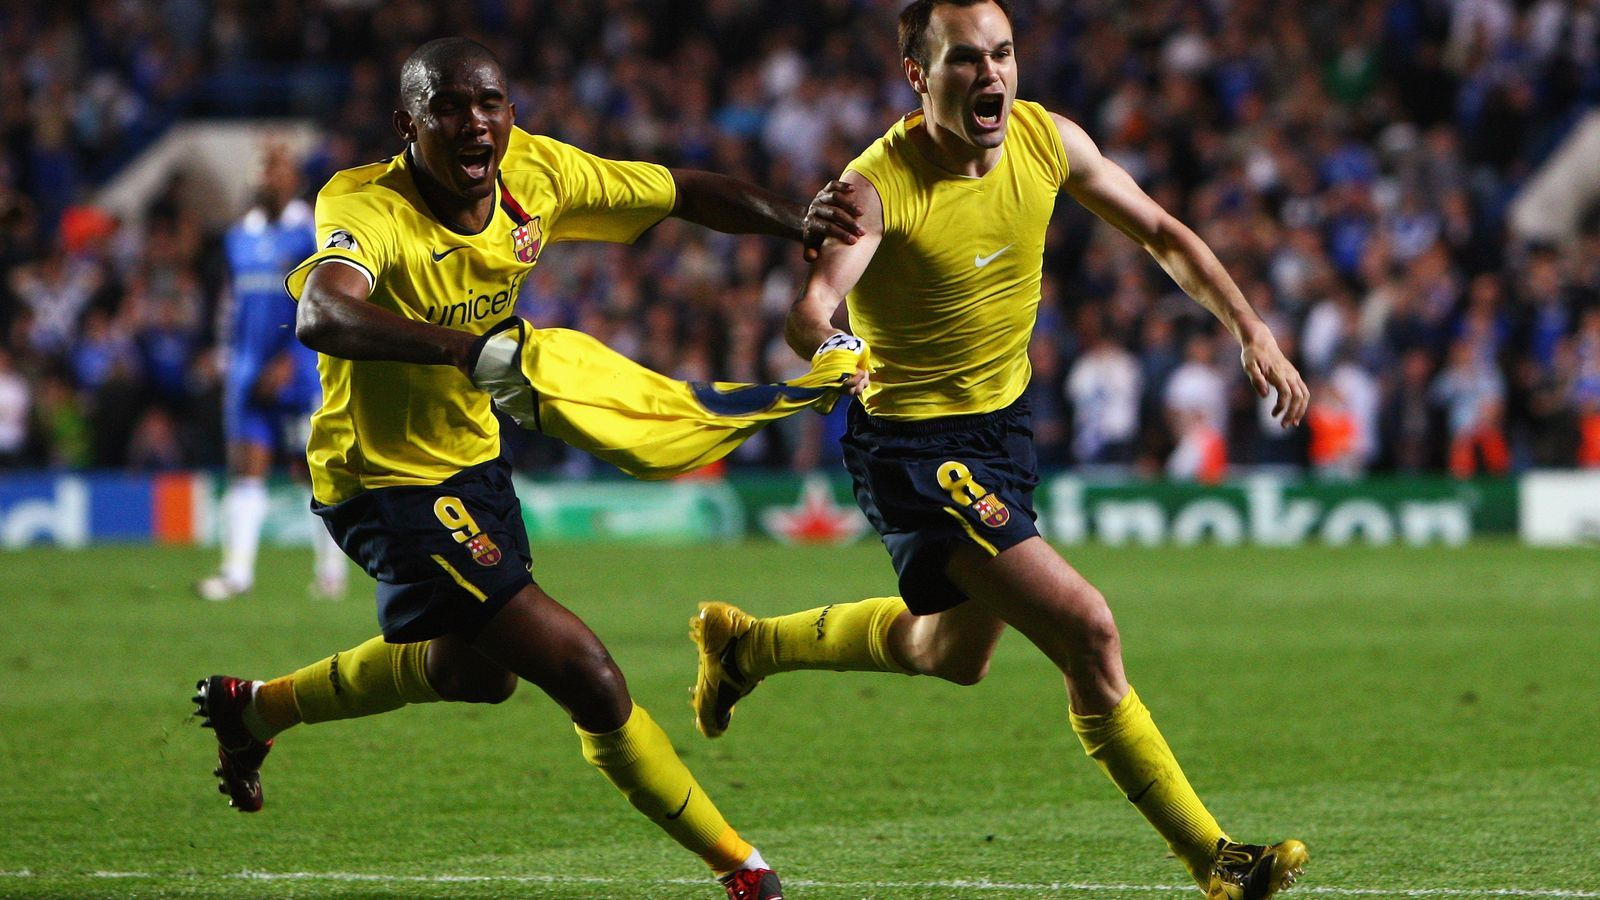 10 anys del gol d'Iniesta a Stamford Bridge